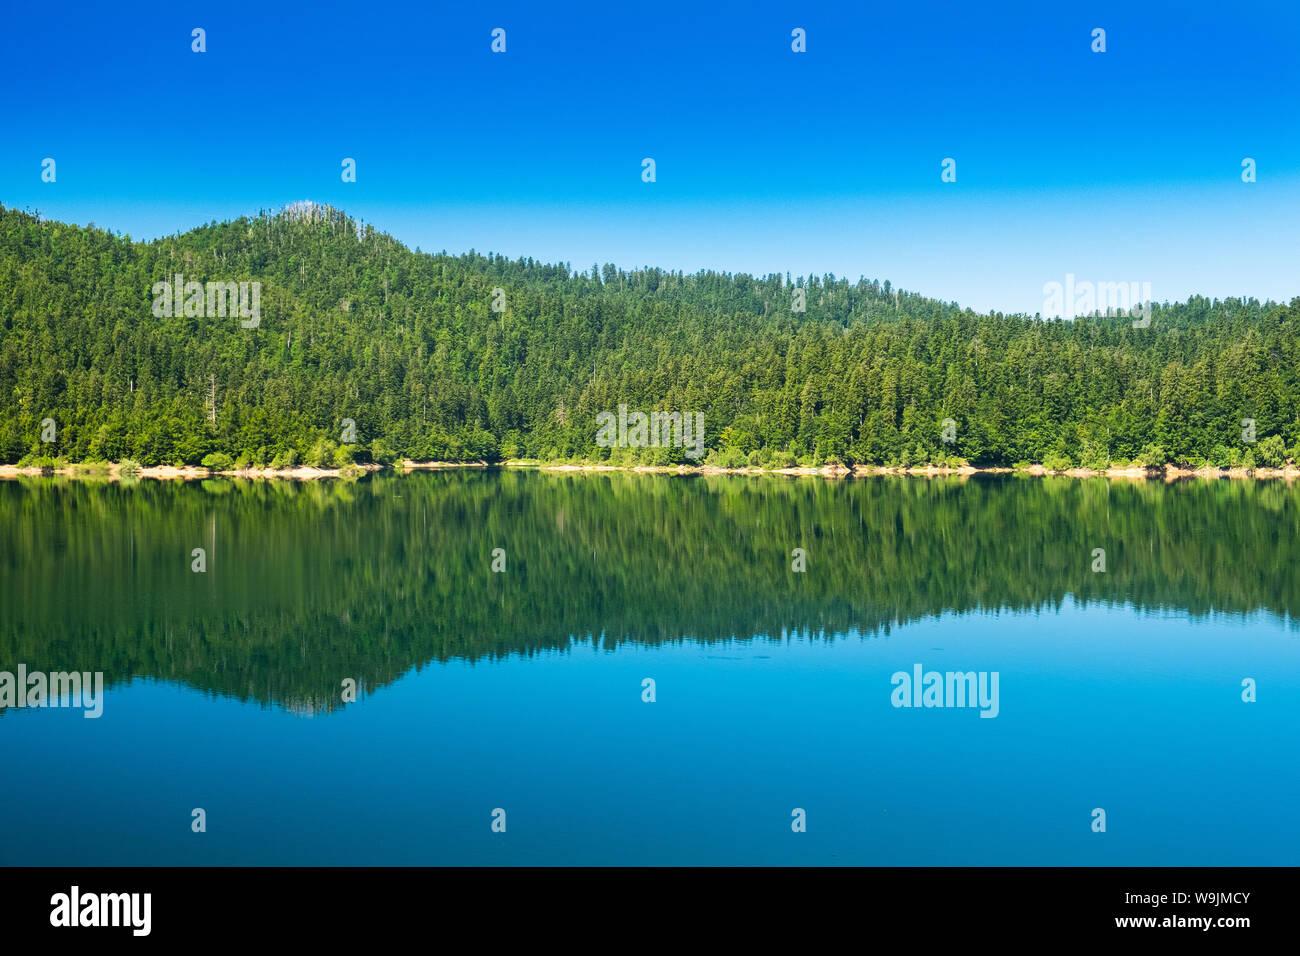 Croatia, beautiful blue lake in Gorski kotar, Lokve, Croatia, with Risnjak mountain in background, reflection in watter Stock Photo